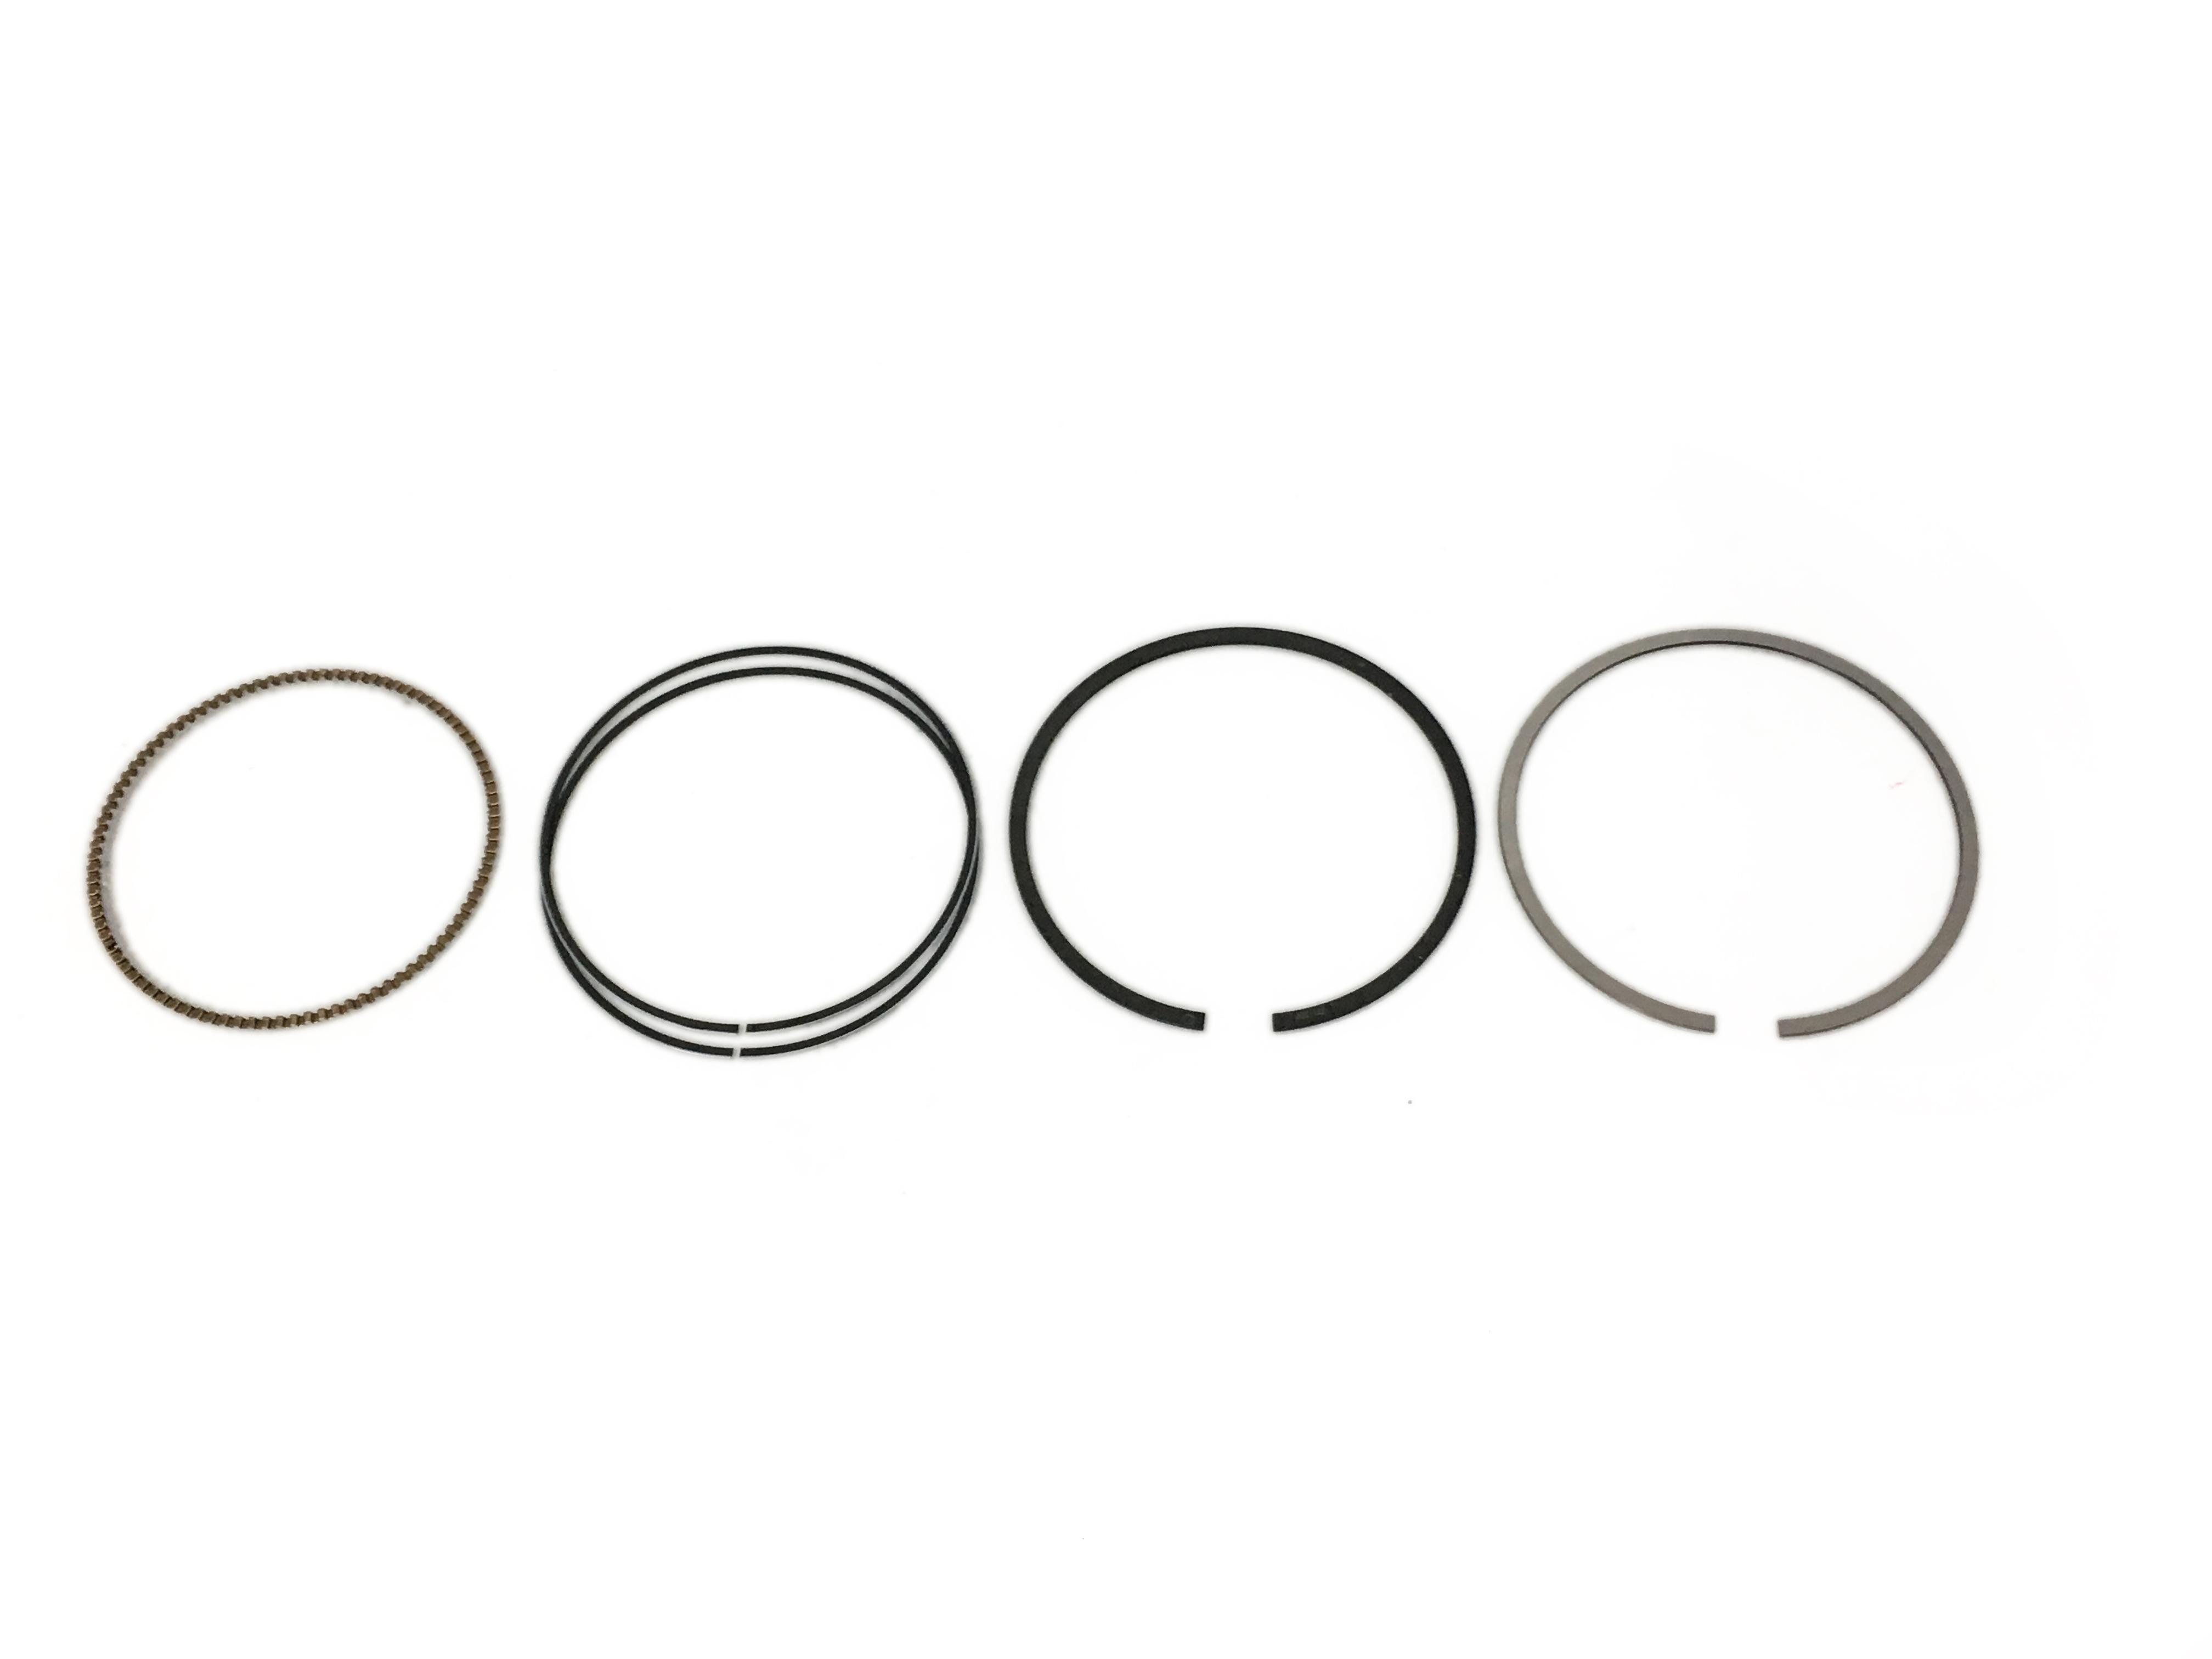 1x anneau de Piston BMW série 3 2,0 N43B20 N43B20A N20B20A 11257562457 NOUVEAU